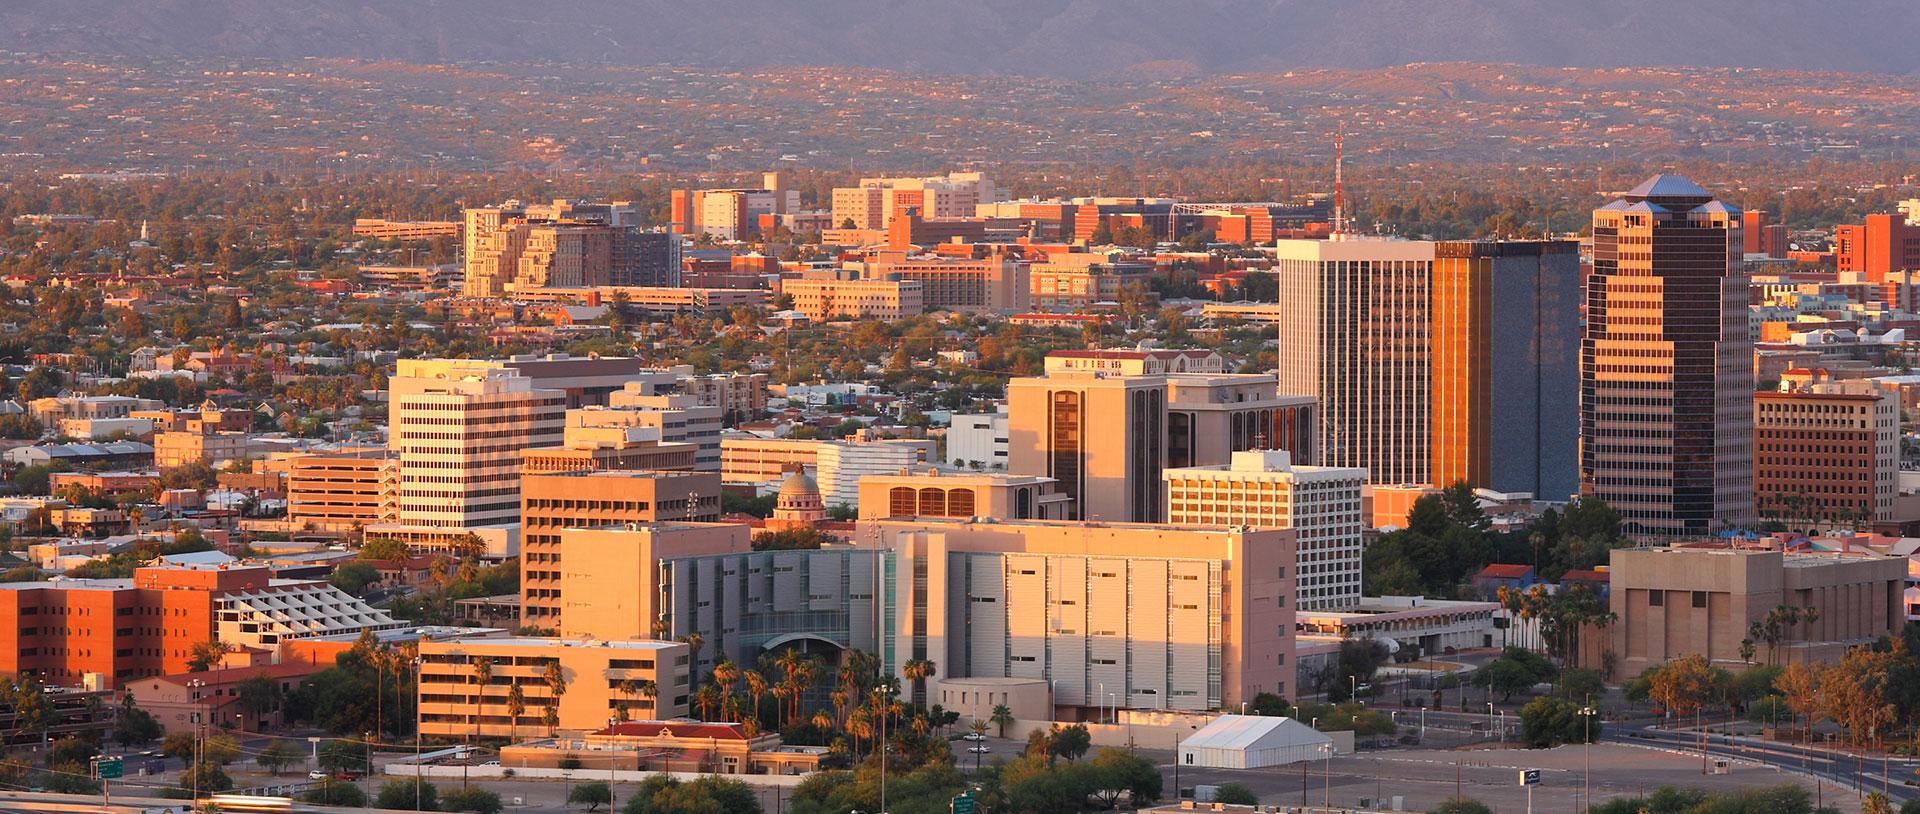 Tucson Arizona skyline